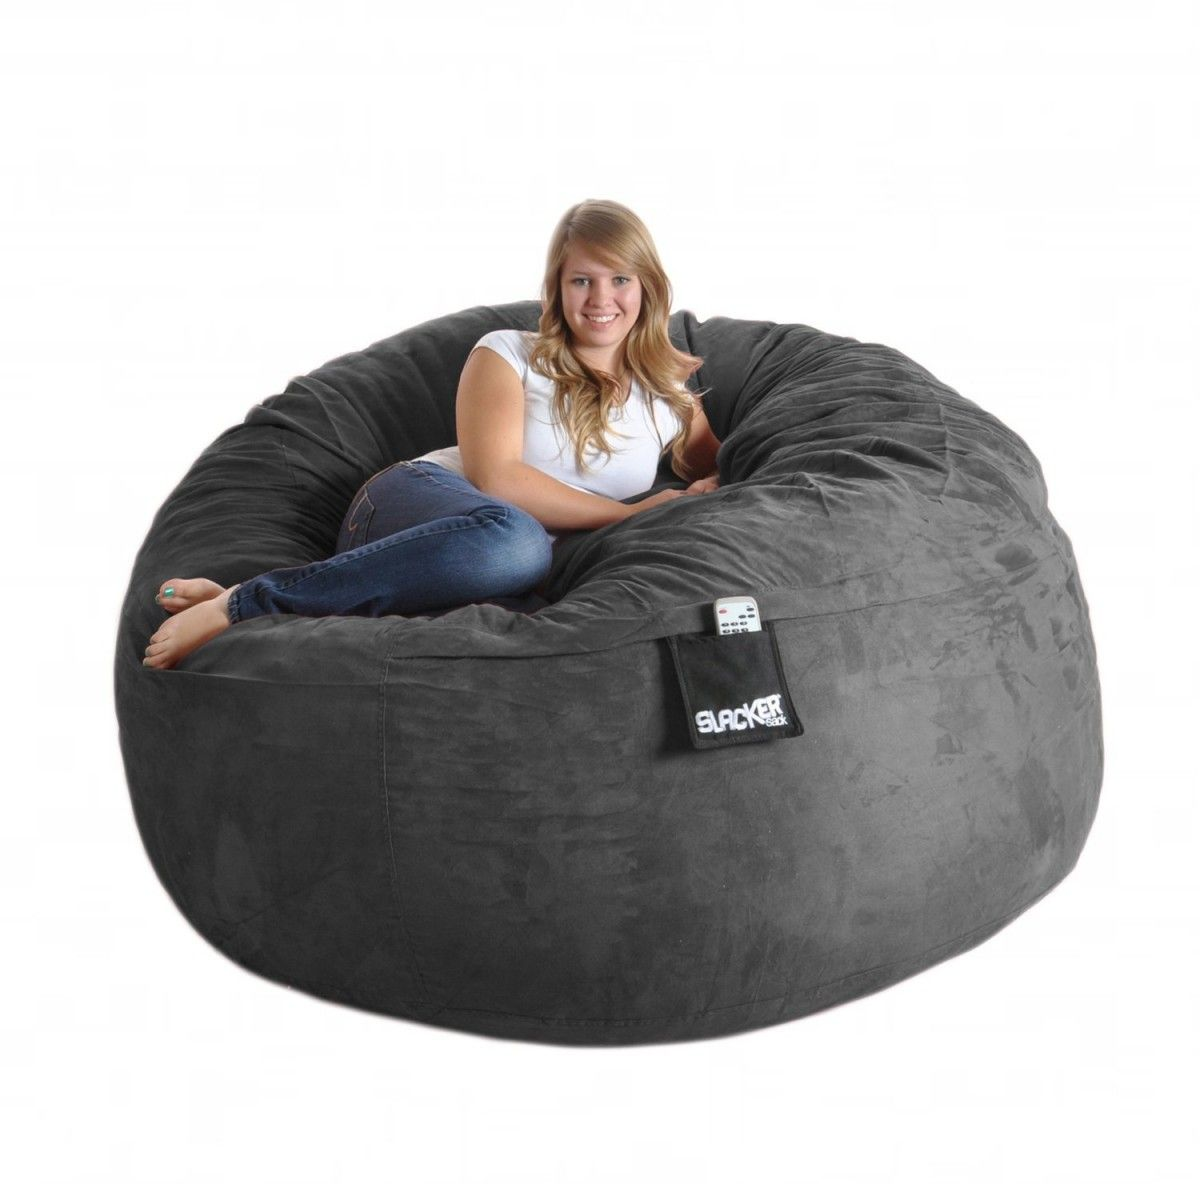 The Comfortable Large Bean Bag Chair Sitzsack Sofa Große Sitzsäcke Grüne Tasche